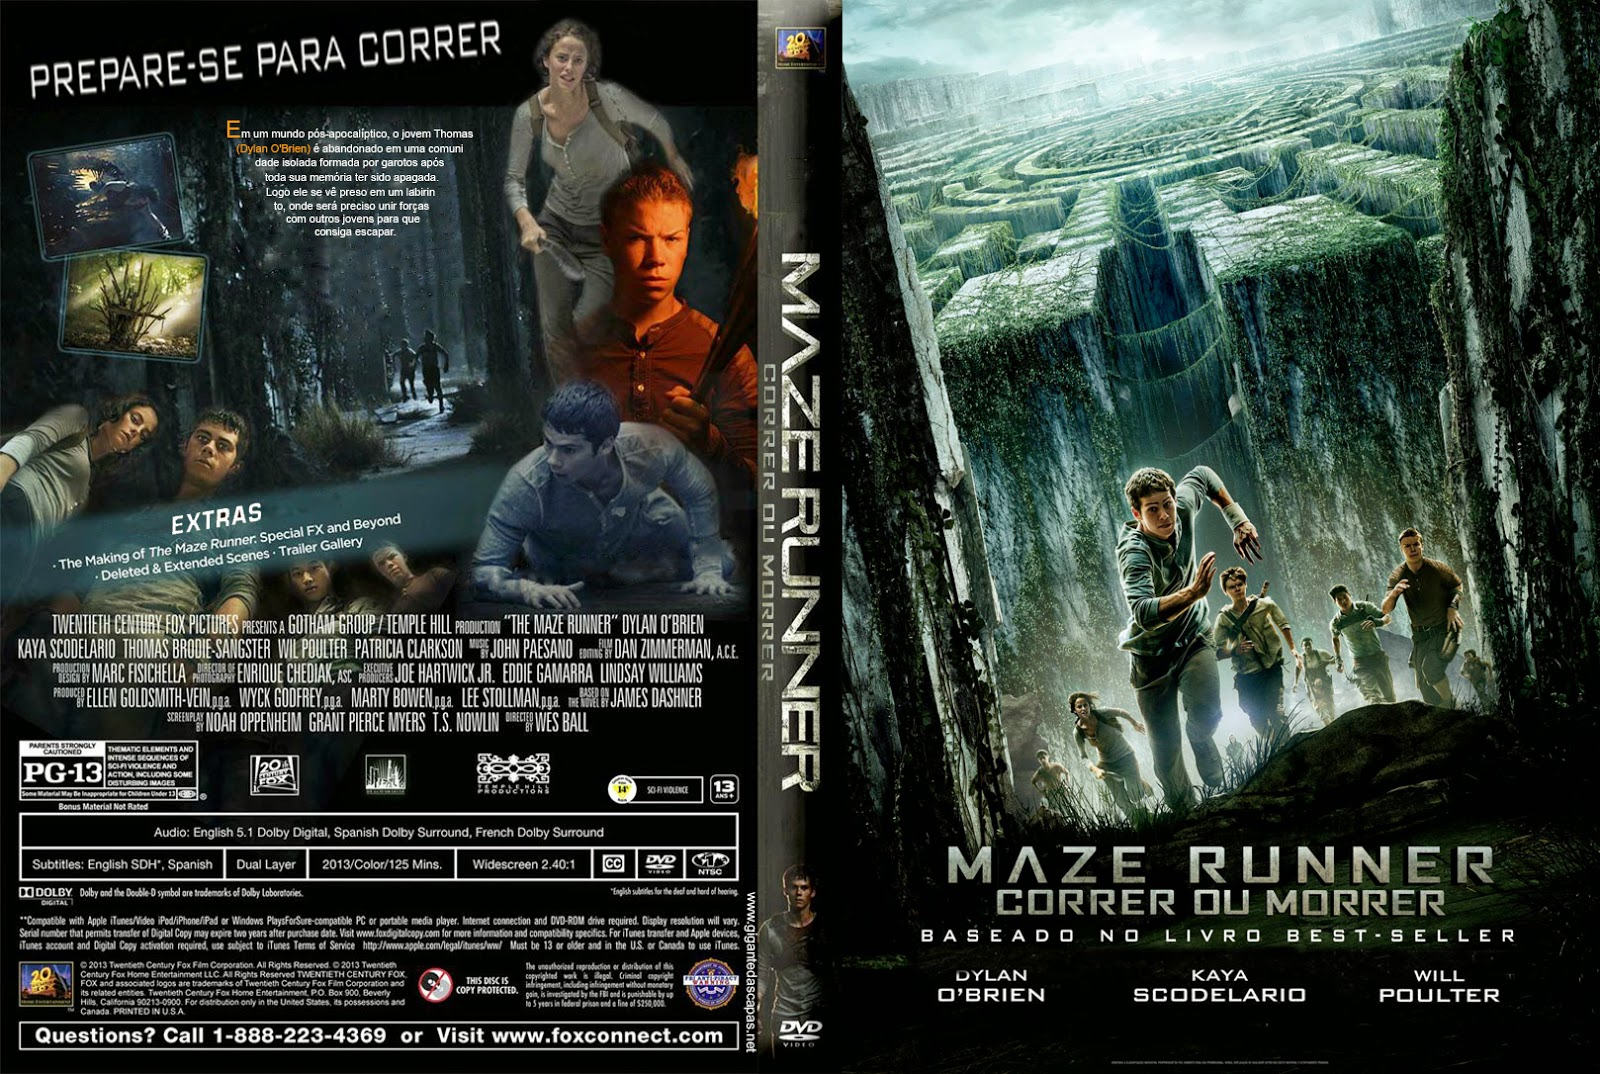 Maze runner correr ou morrer